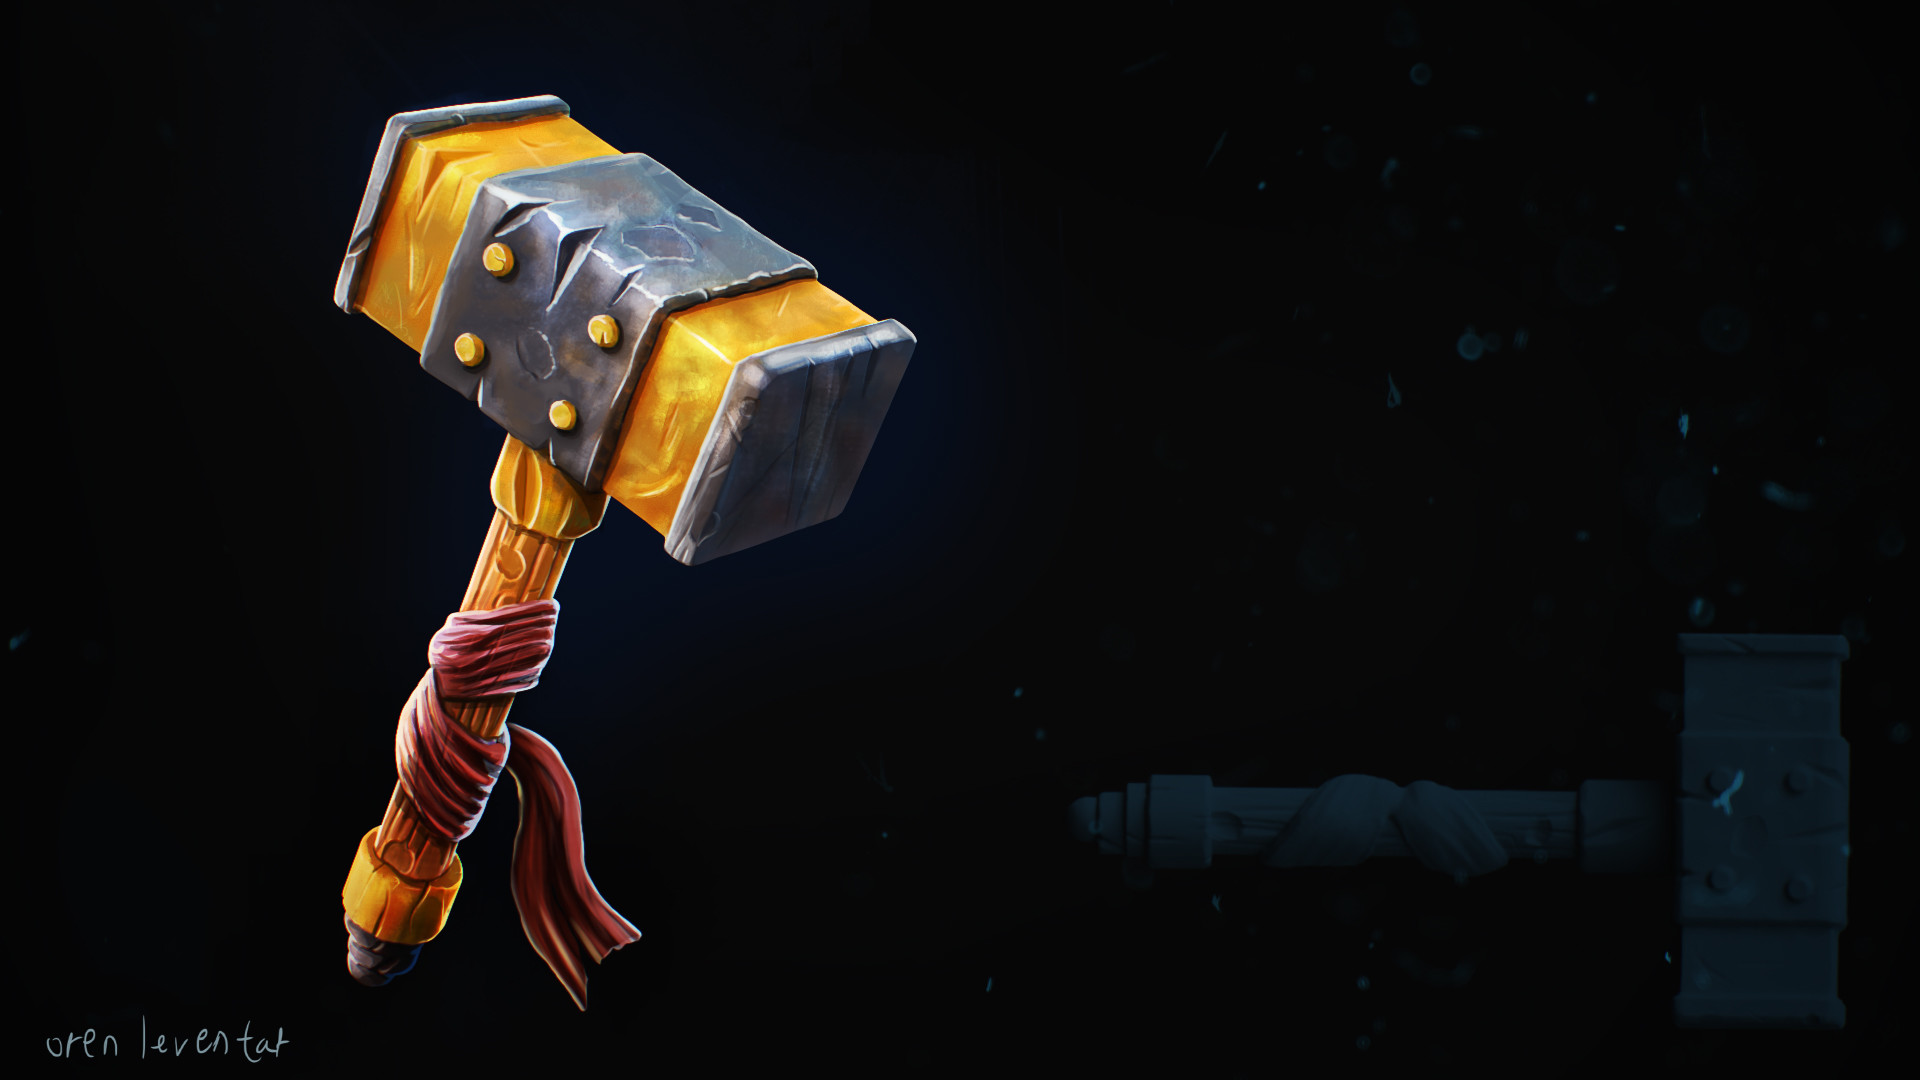 Oren leventar hammer web